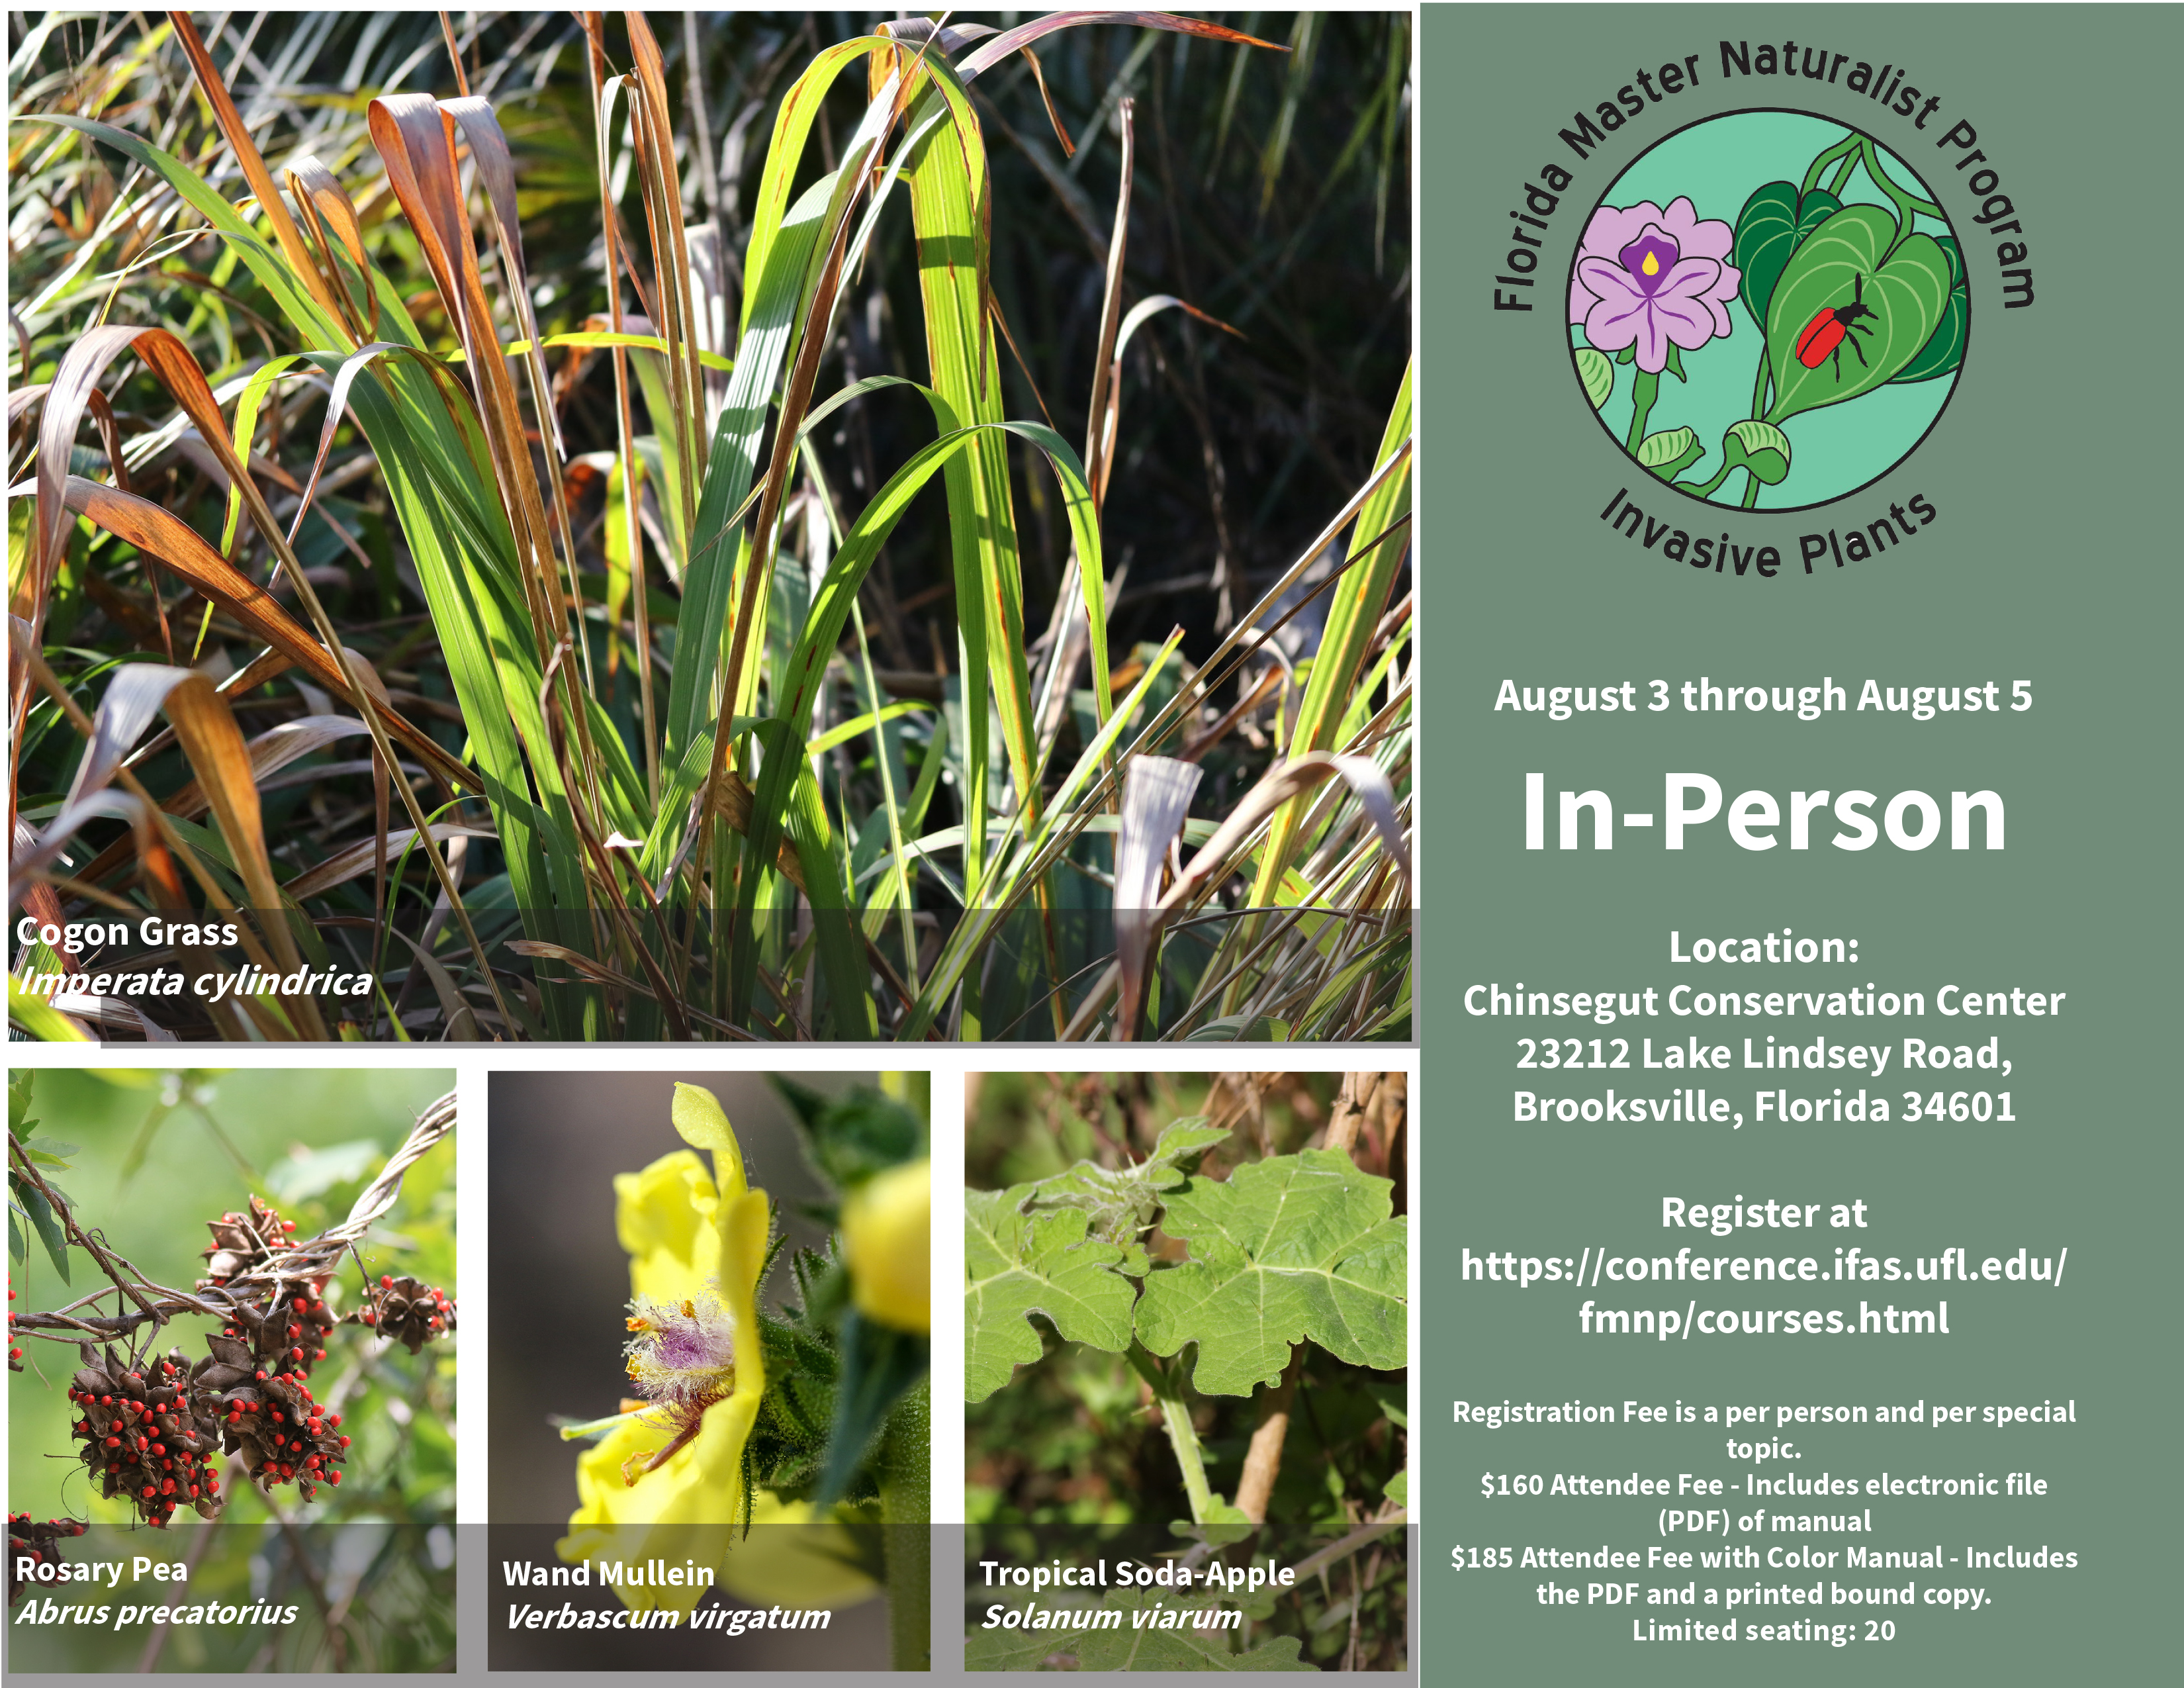 Florida Master Naturalist Program- Invasive Plants of Florida